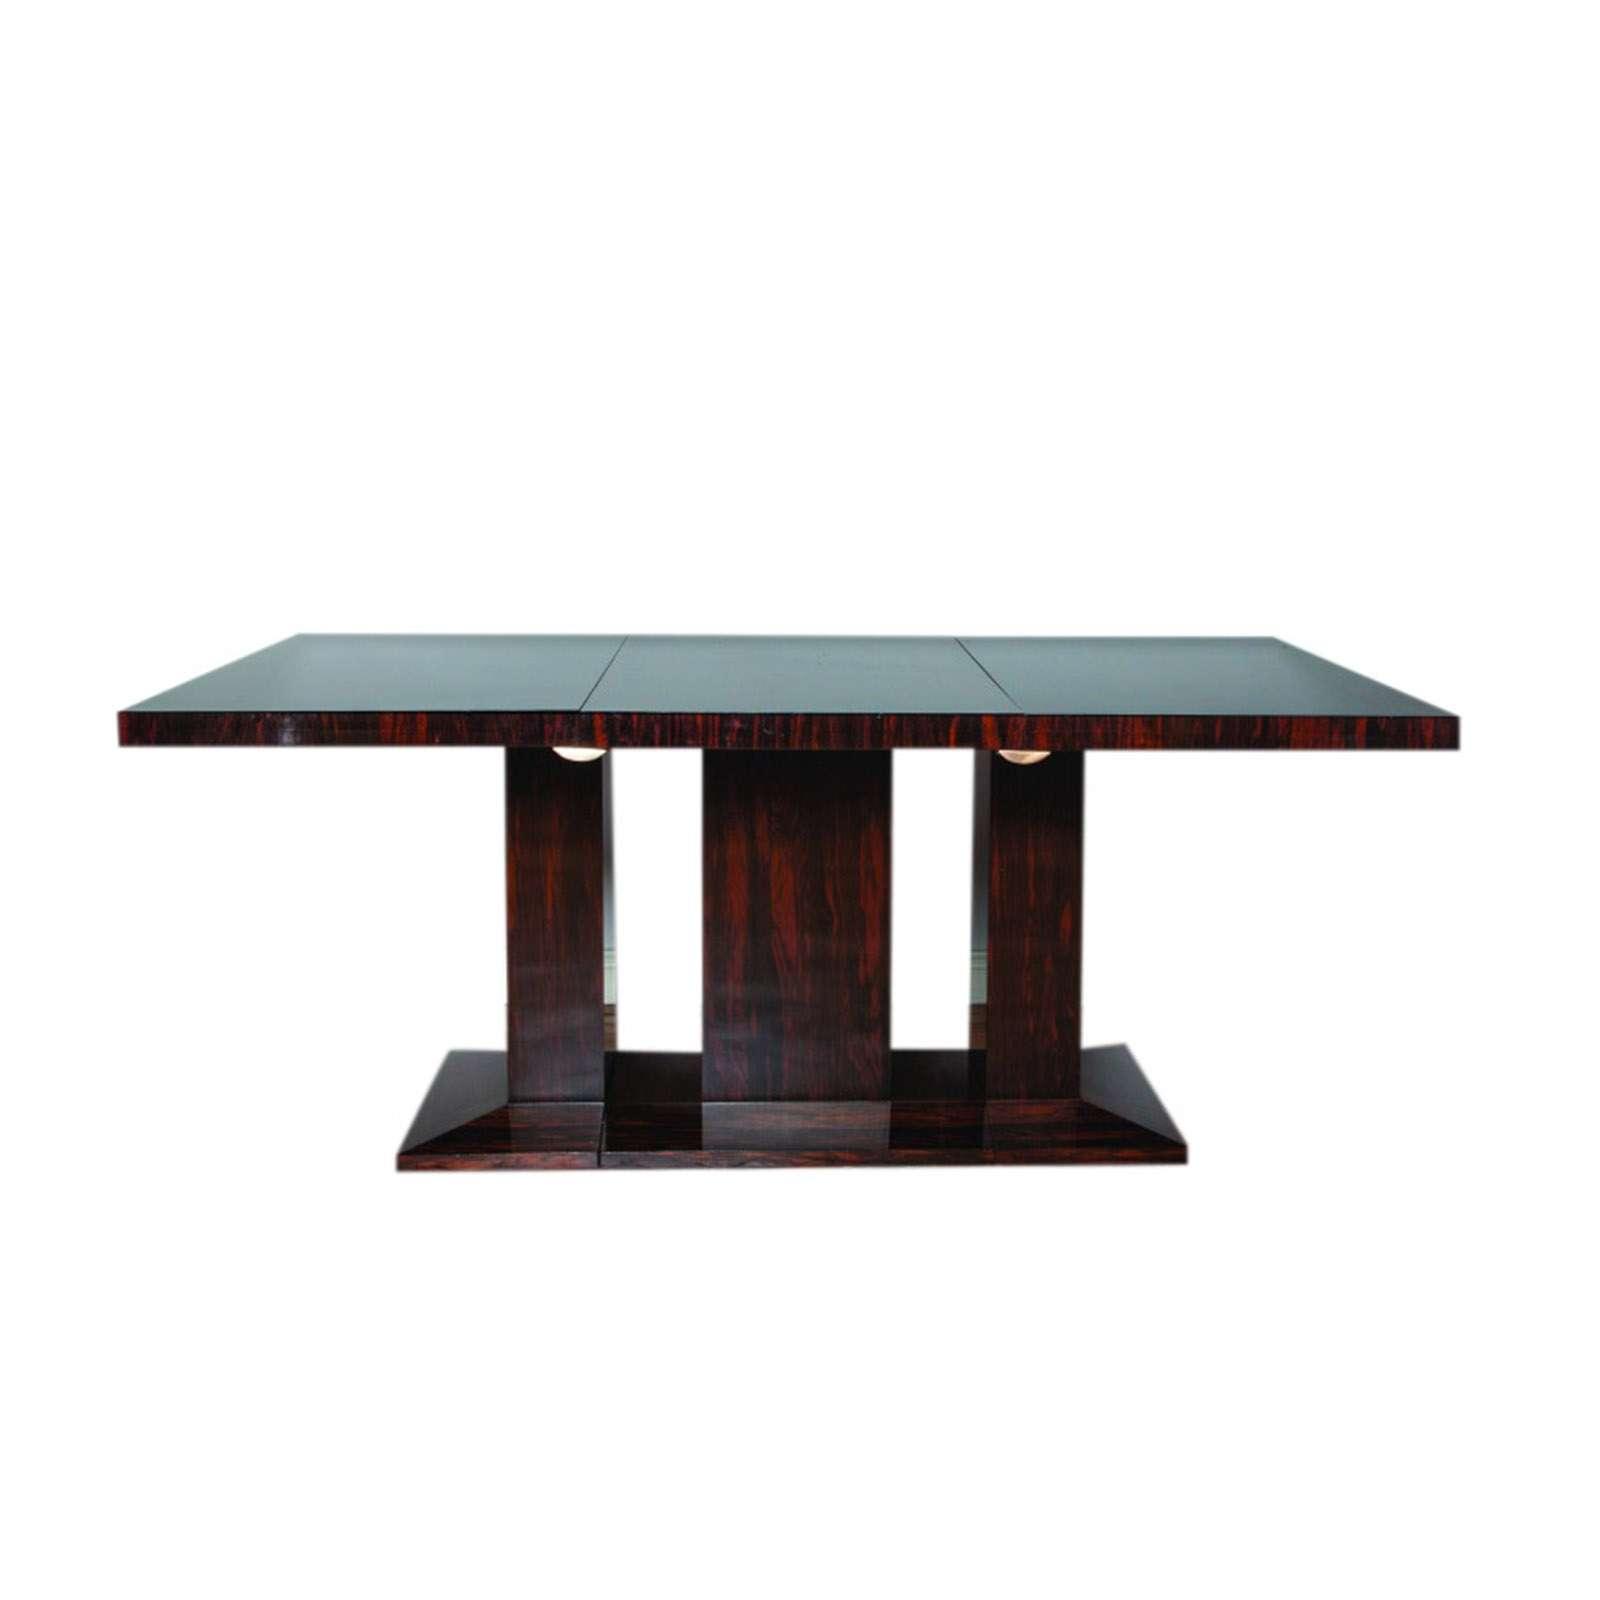 Exceptional Art Deco Coromandle Three Part Centre Table